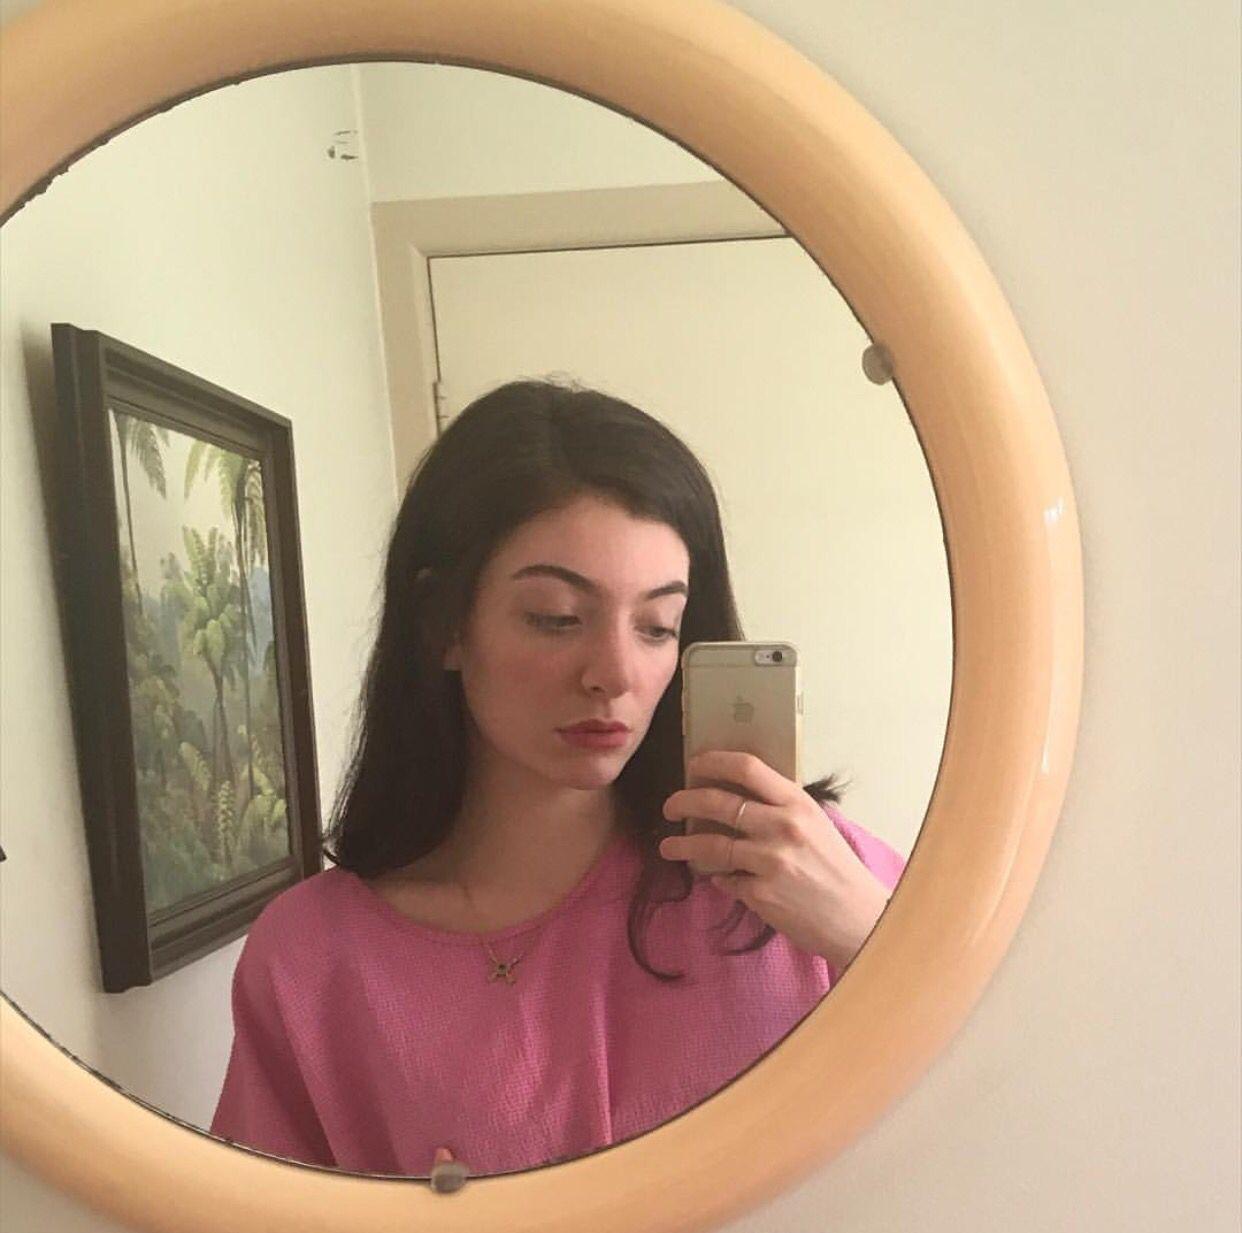 Selfie Lorde nudes (58 foto and video), Sexy, Bikini, Selfie, butt 2017